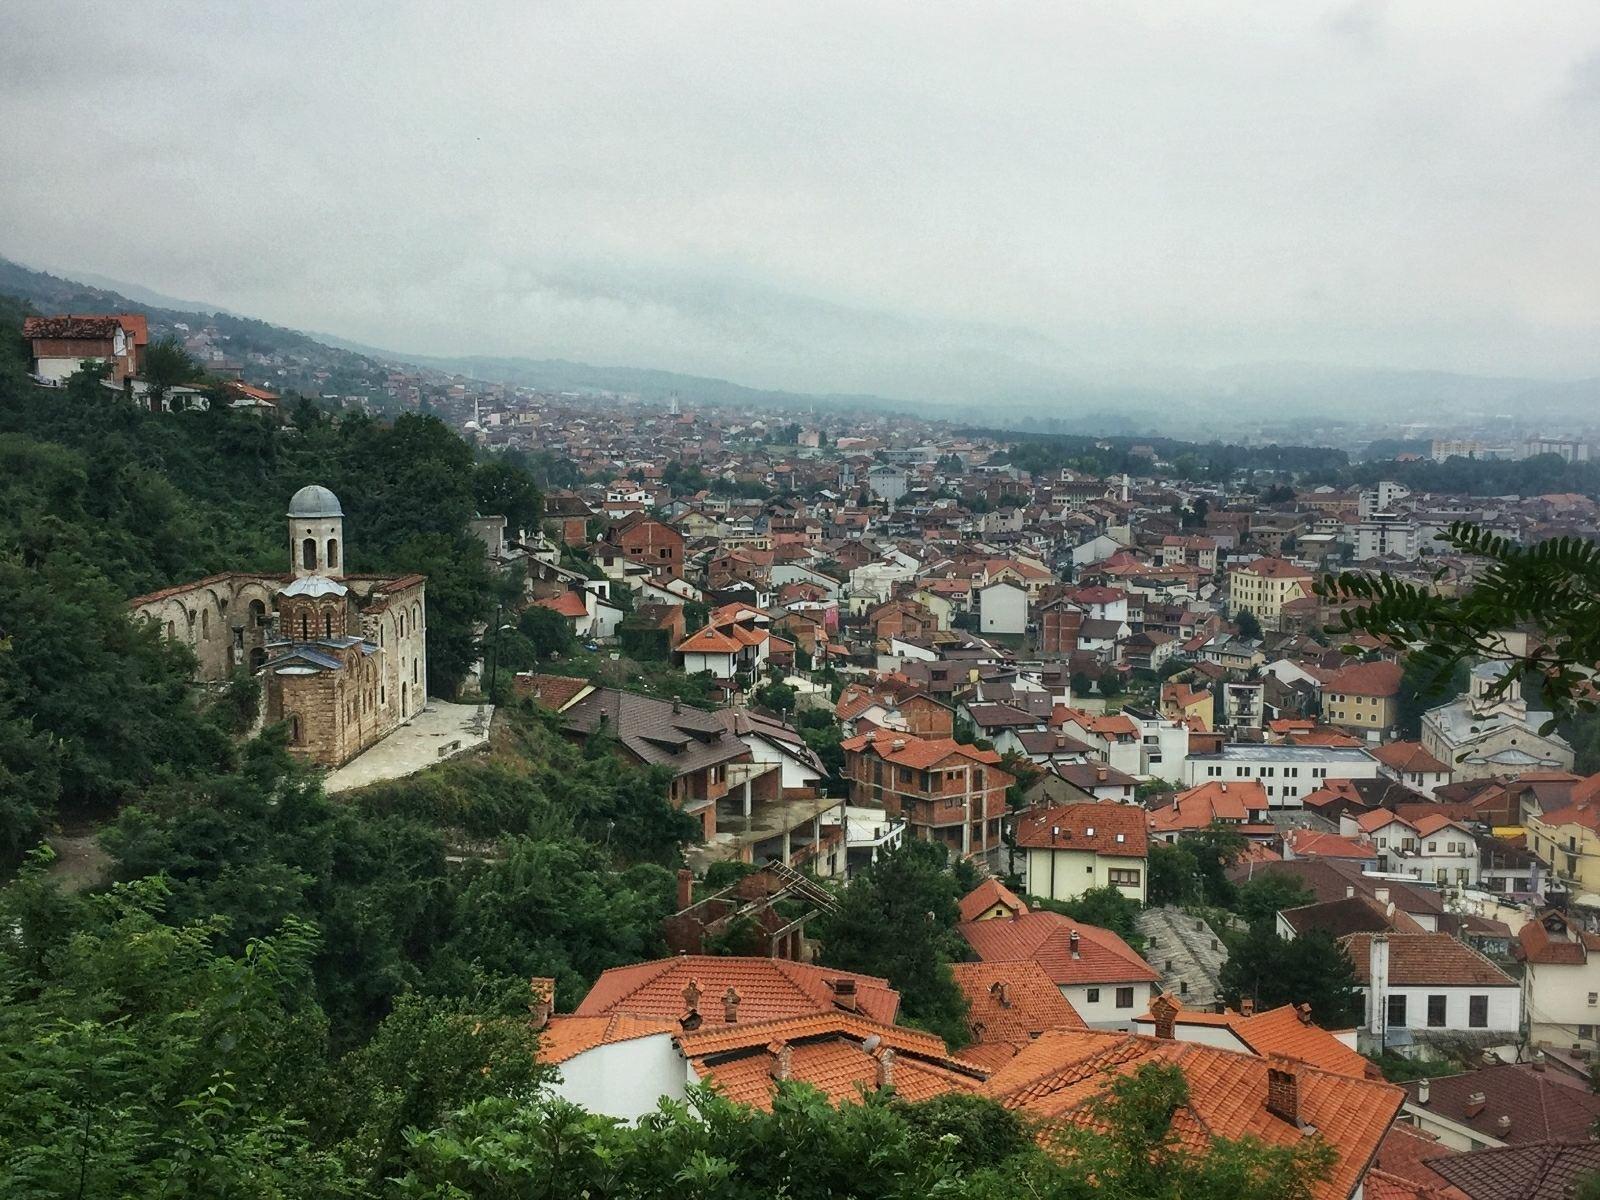 Sightseeing Prizren | Fortress view